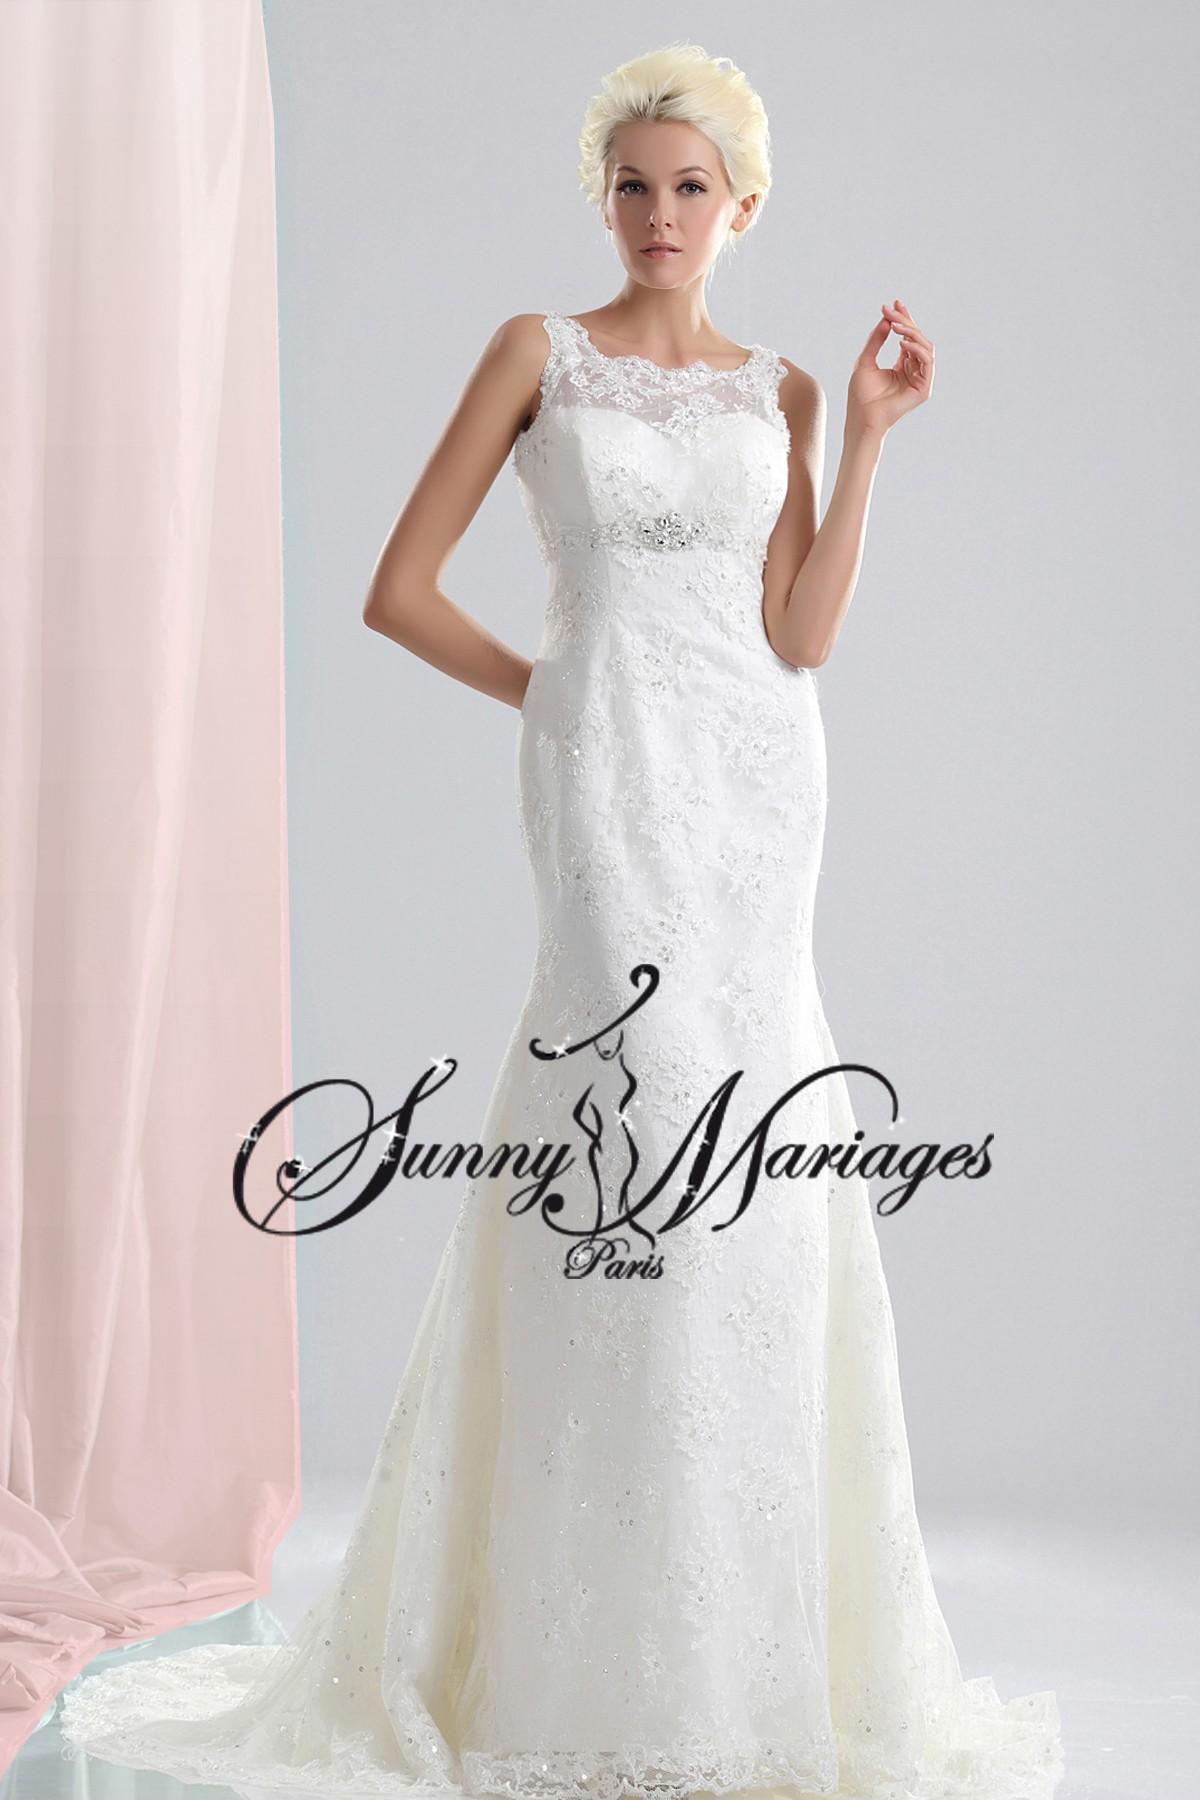 ... Mariage » robe de mariée » Robe de mariée dentelle « CALINE